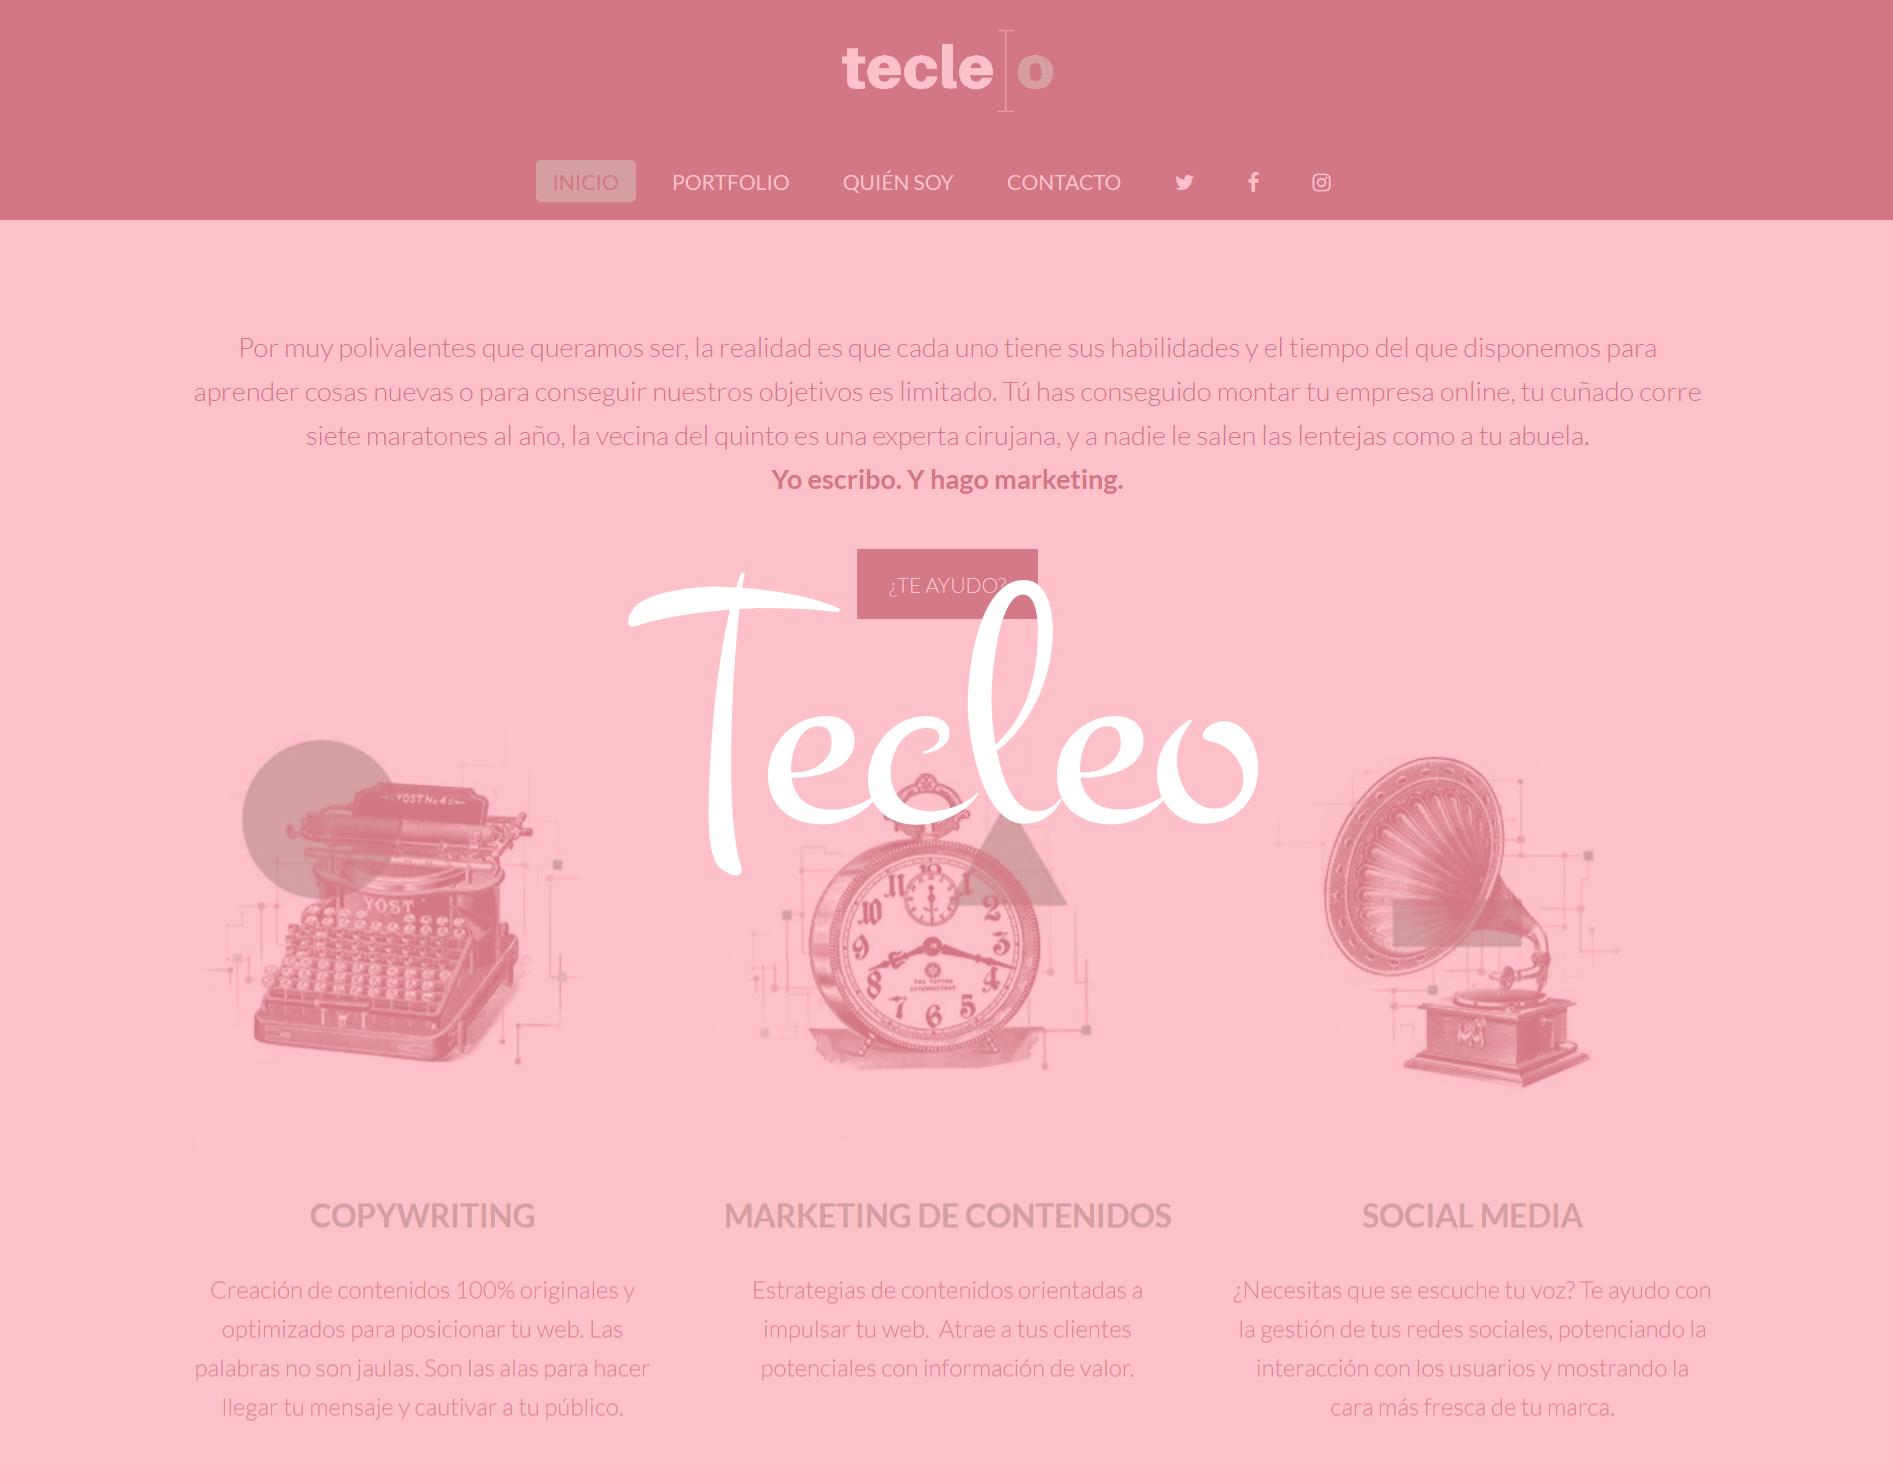 tecleo web